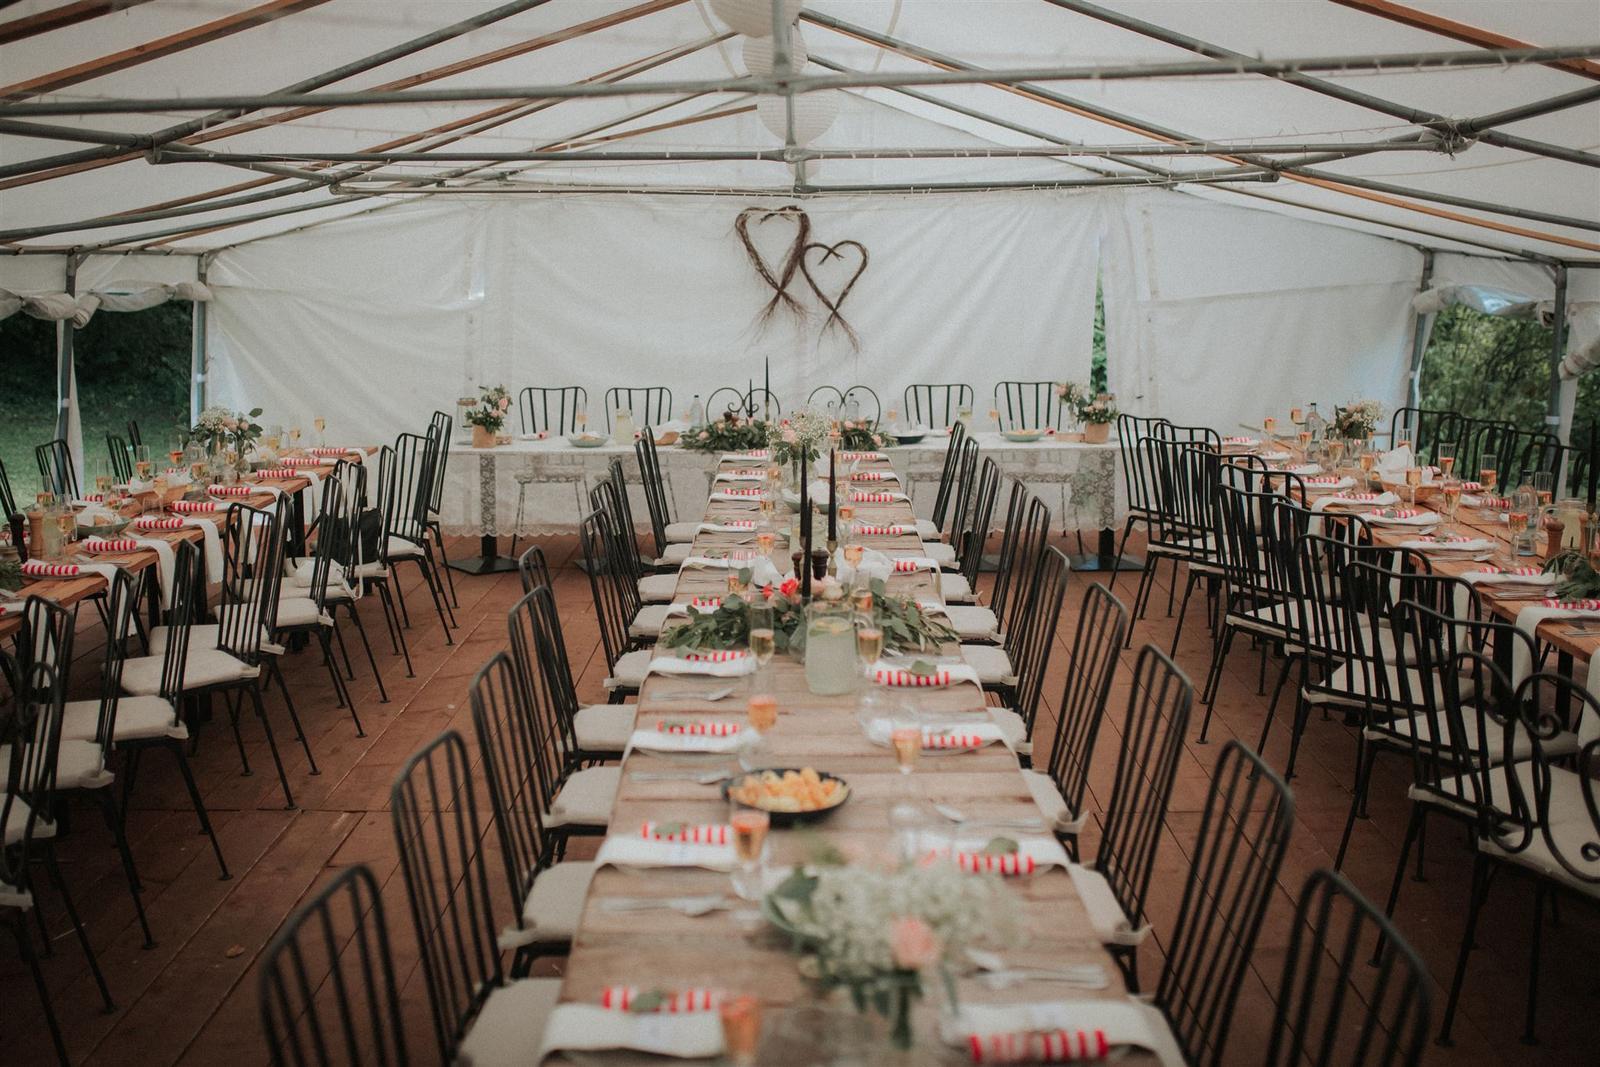 Krásna a romantická svadobná party v záhrade reštaurácie Bistra Dukát - Le Gout v srdci B. Bystrice. - Obrázok č. 15